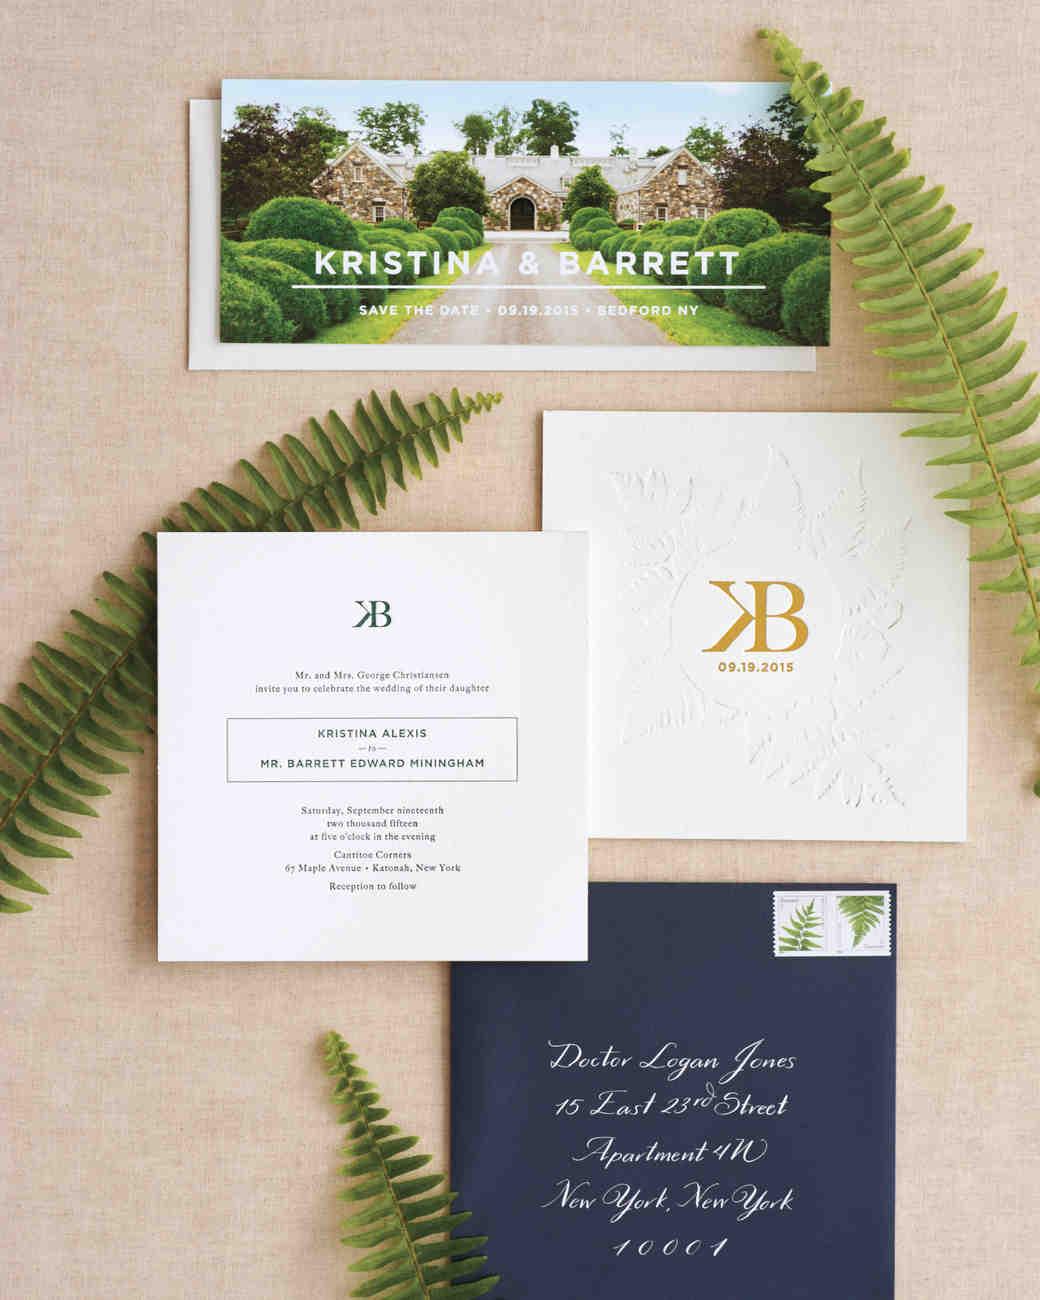 kristina-barrett-wedding-bedford-invitation-2-0125-r-d112650.jpg